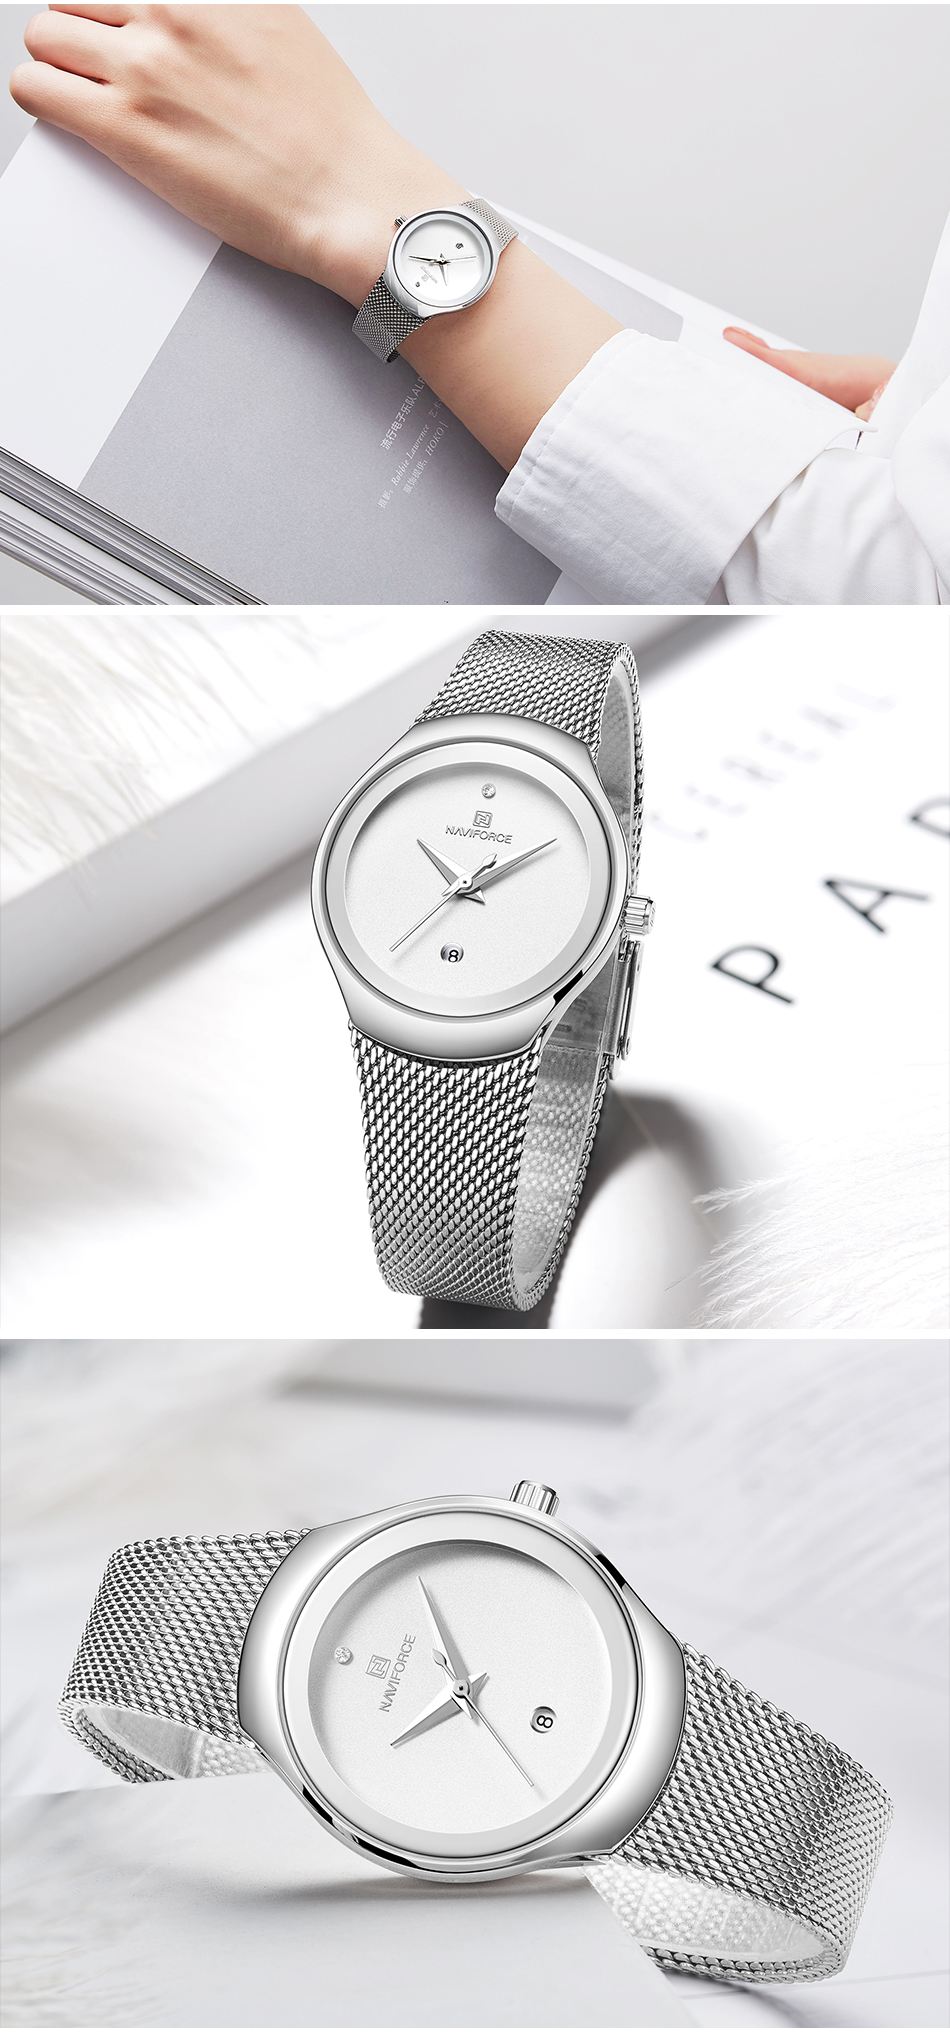 NAVIFORCE Top Luxury Brand Women Watches Female Fashion Simple Quartz Watch Ladies Classic Stainless Steel Mesh Belt Wrist Watch 11